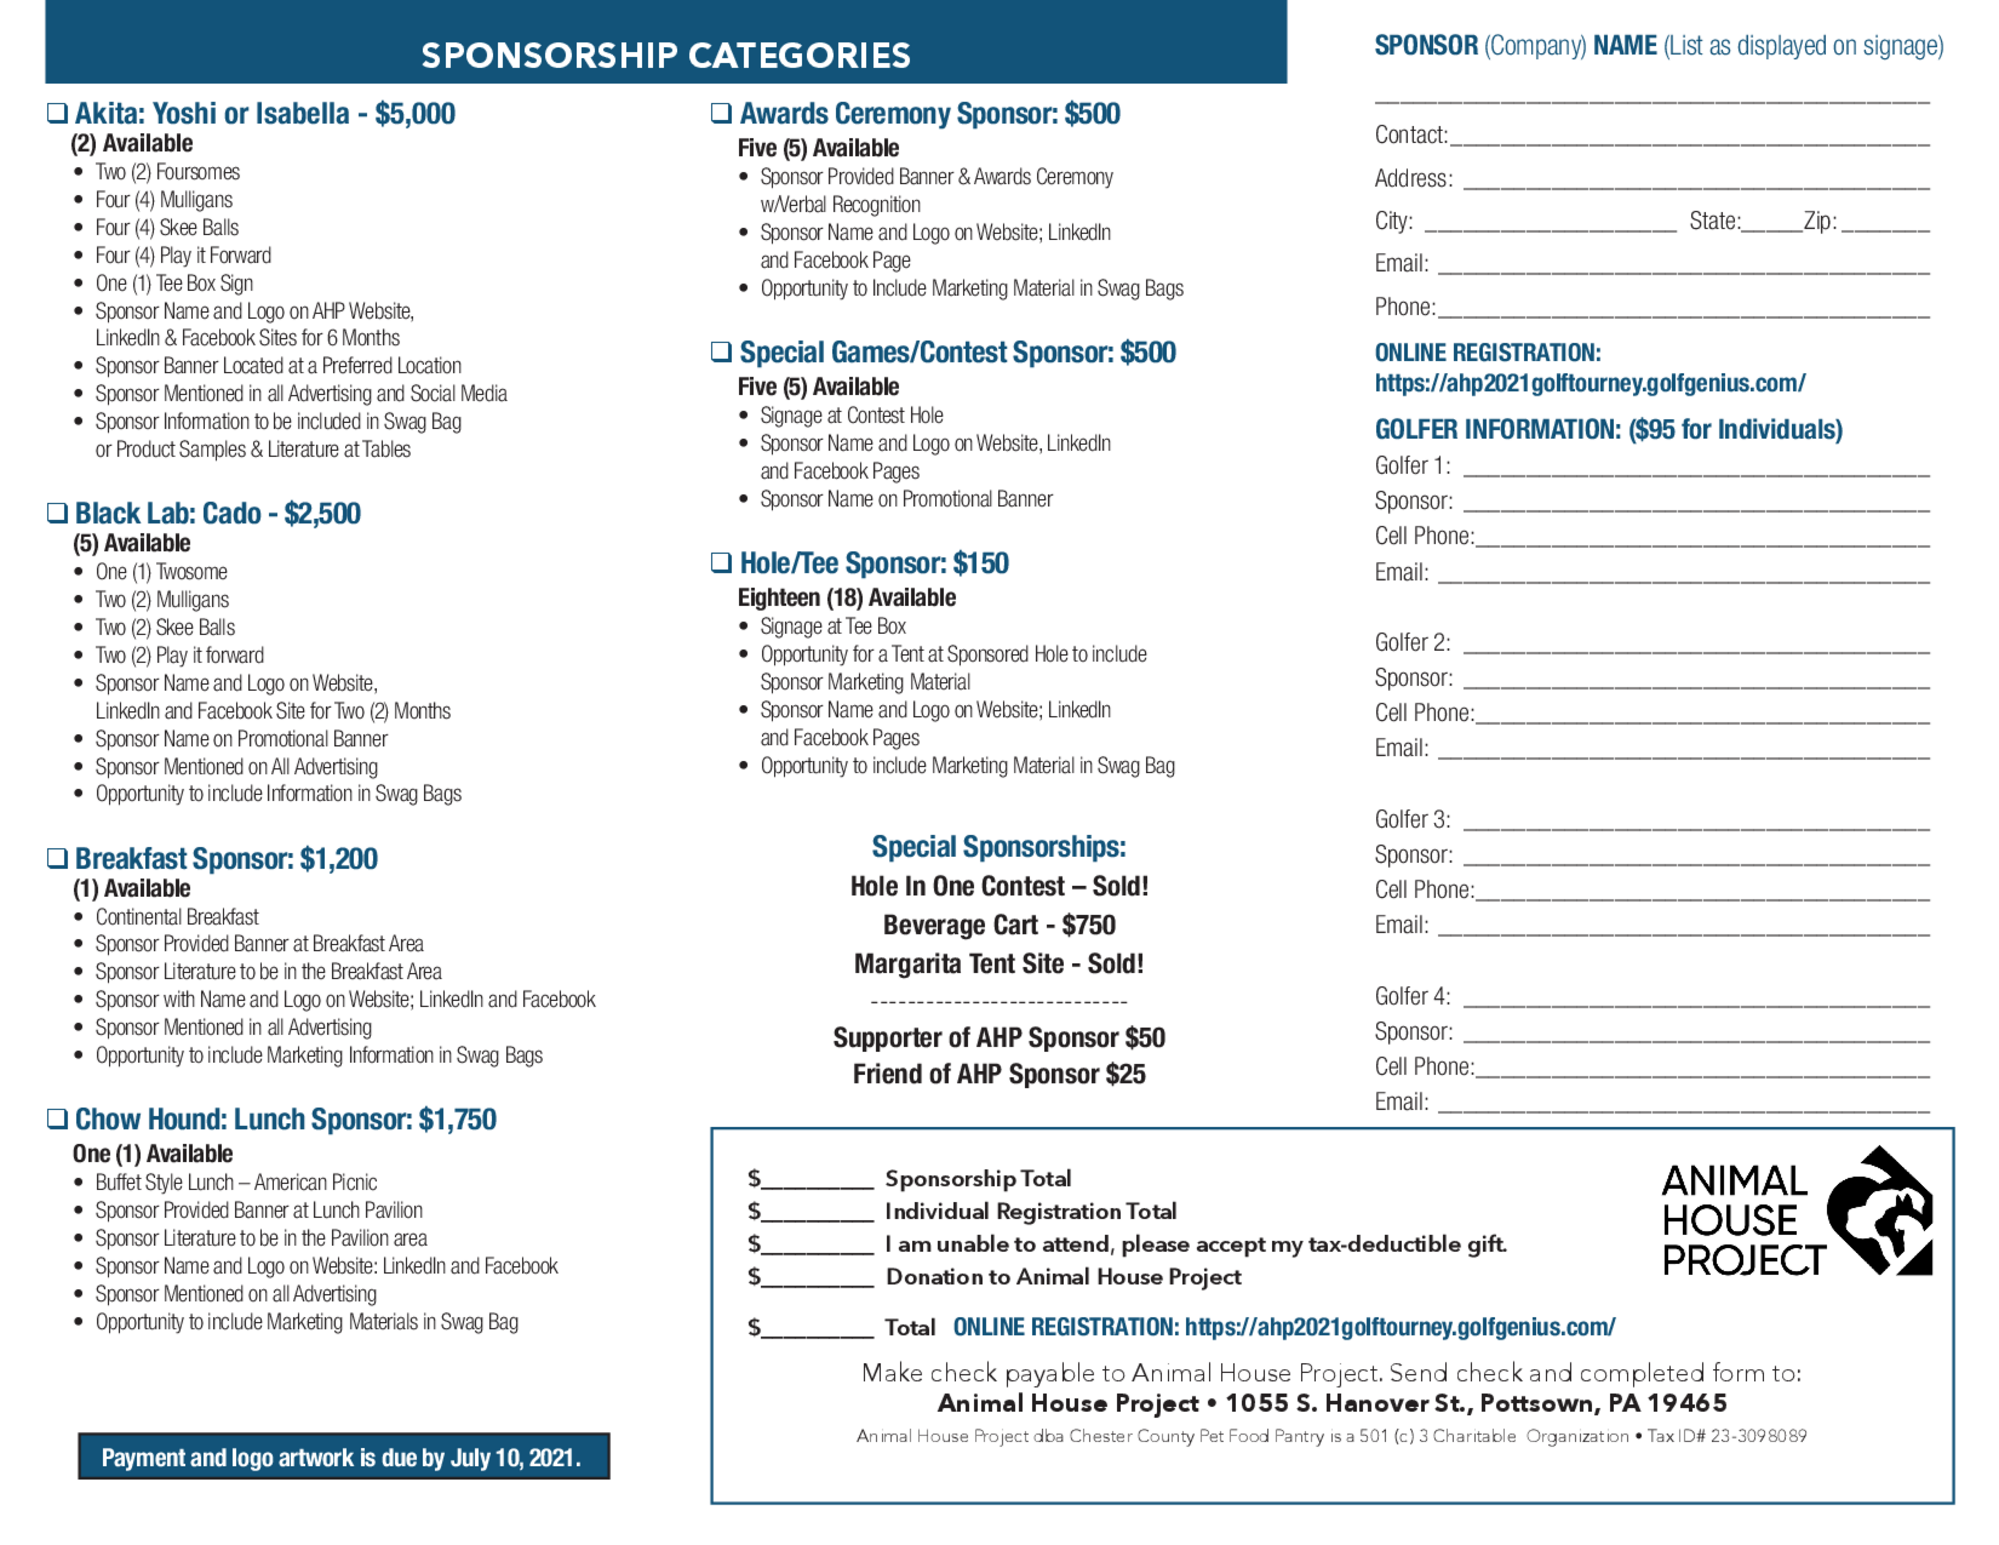 Ahp 2021 golf tournament 2021 05 26 sponsor page 1